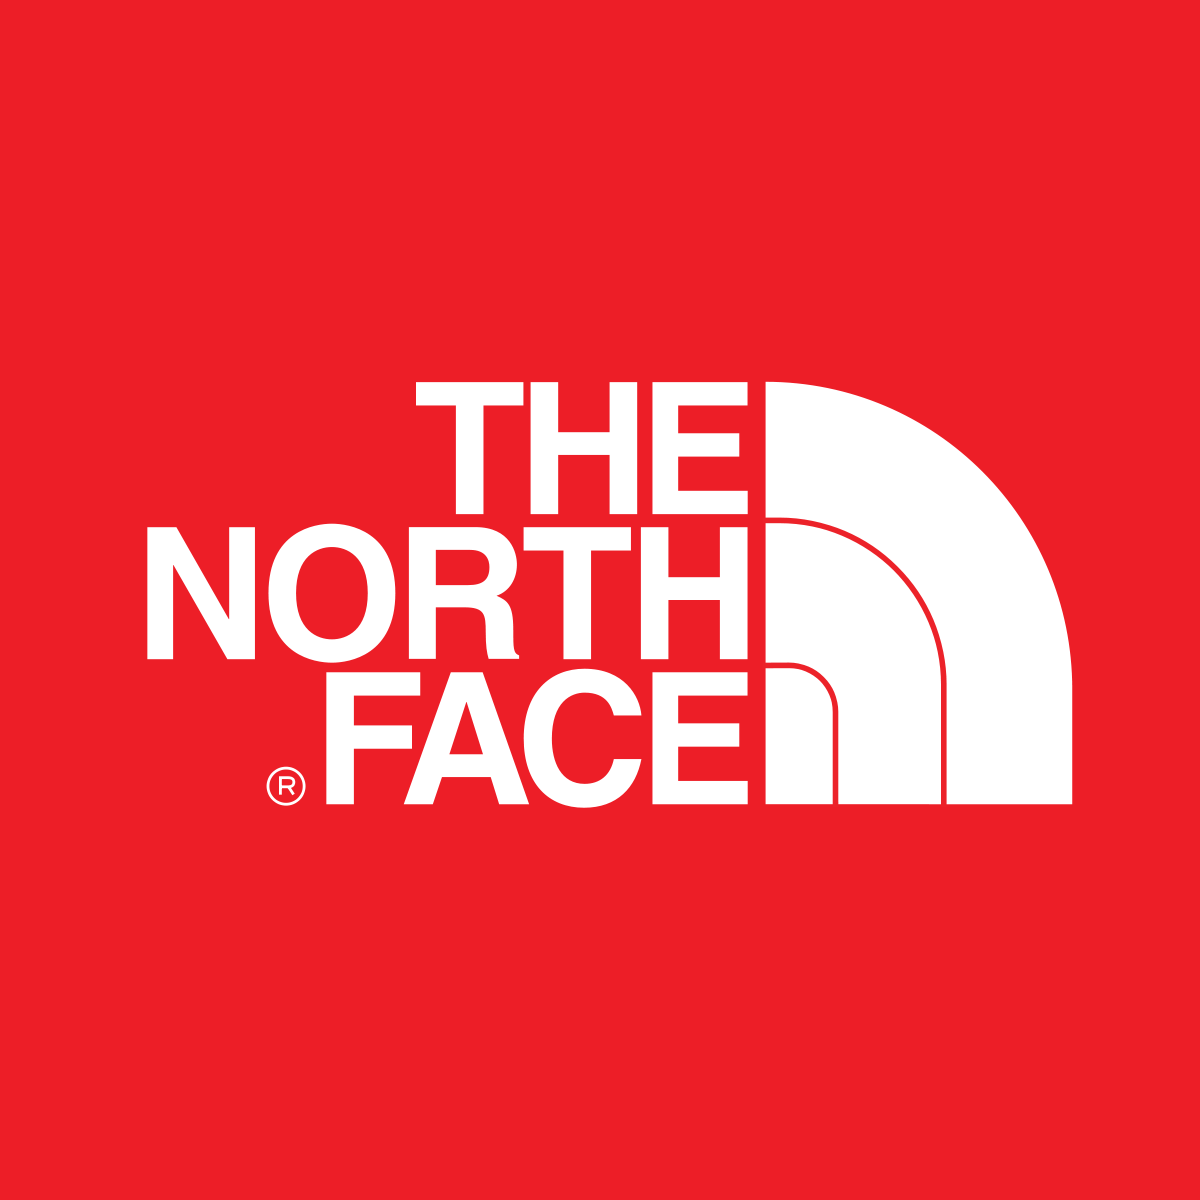 Image Result For David Alcorn Designer The North Face North Face Outfits The North Face Black North Face